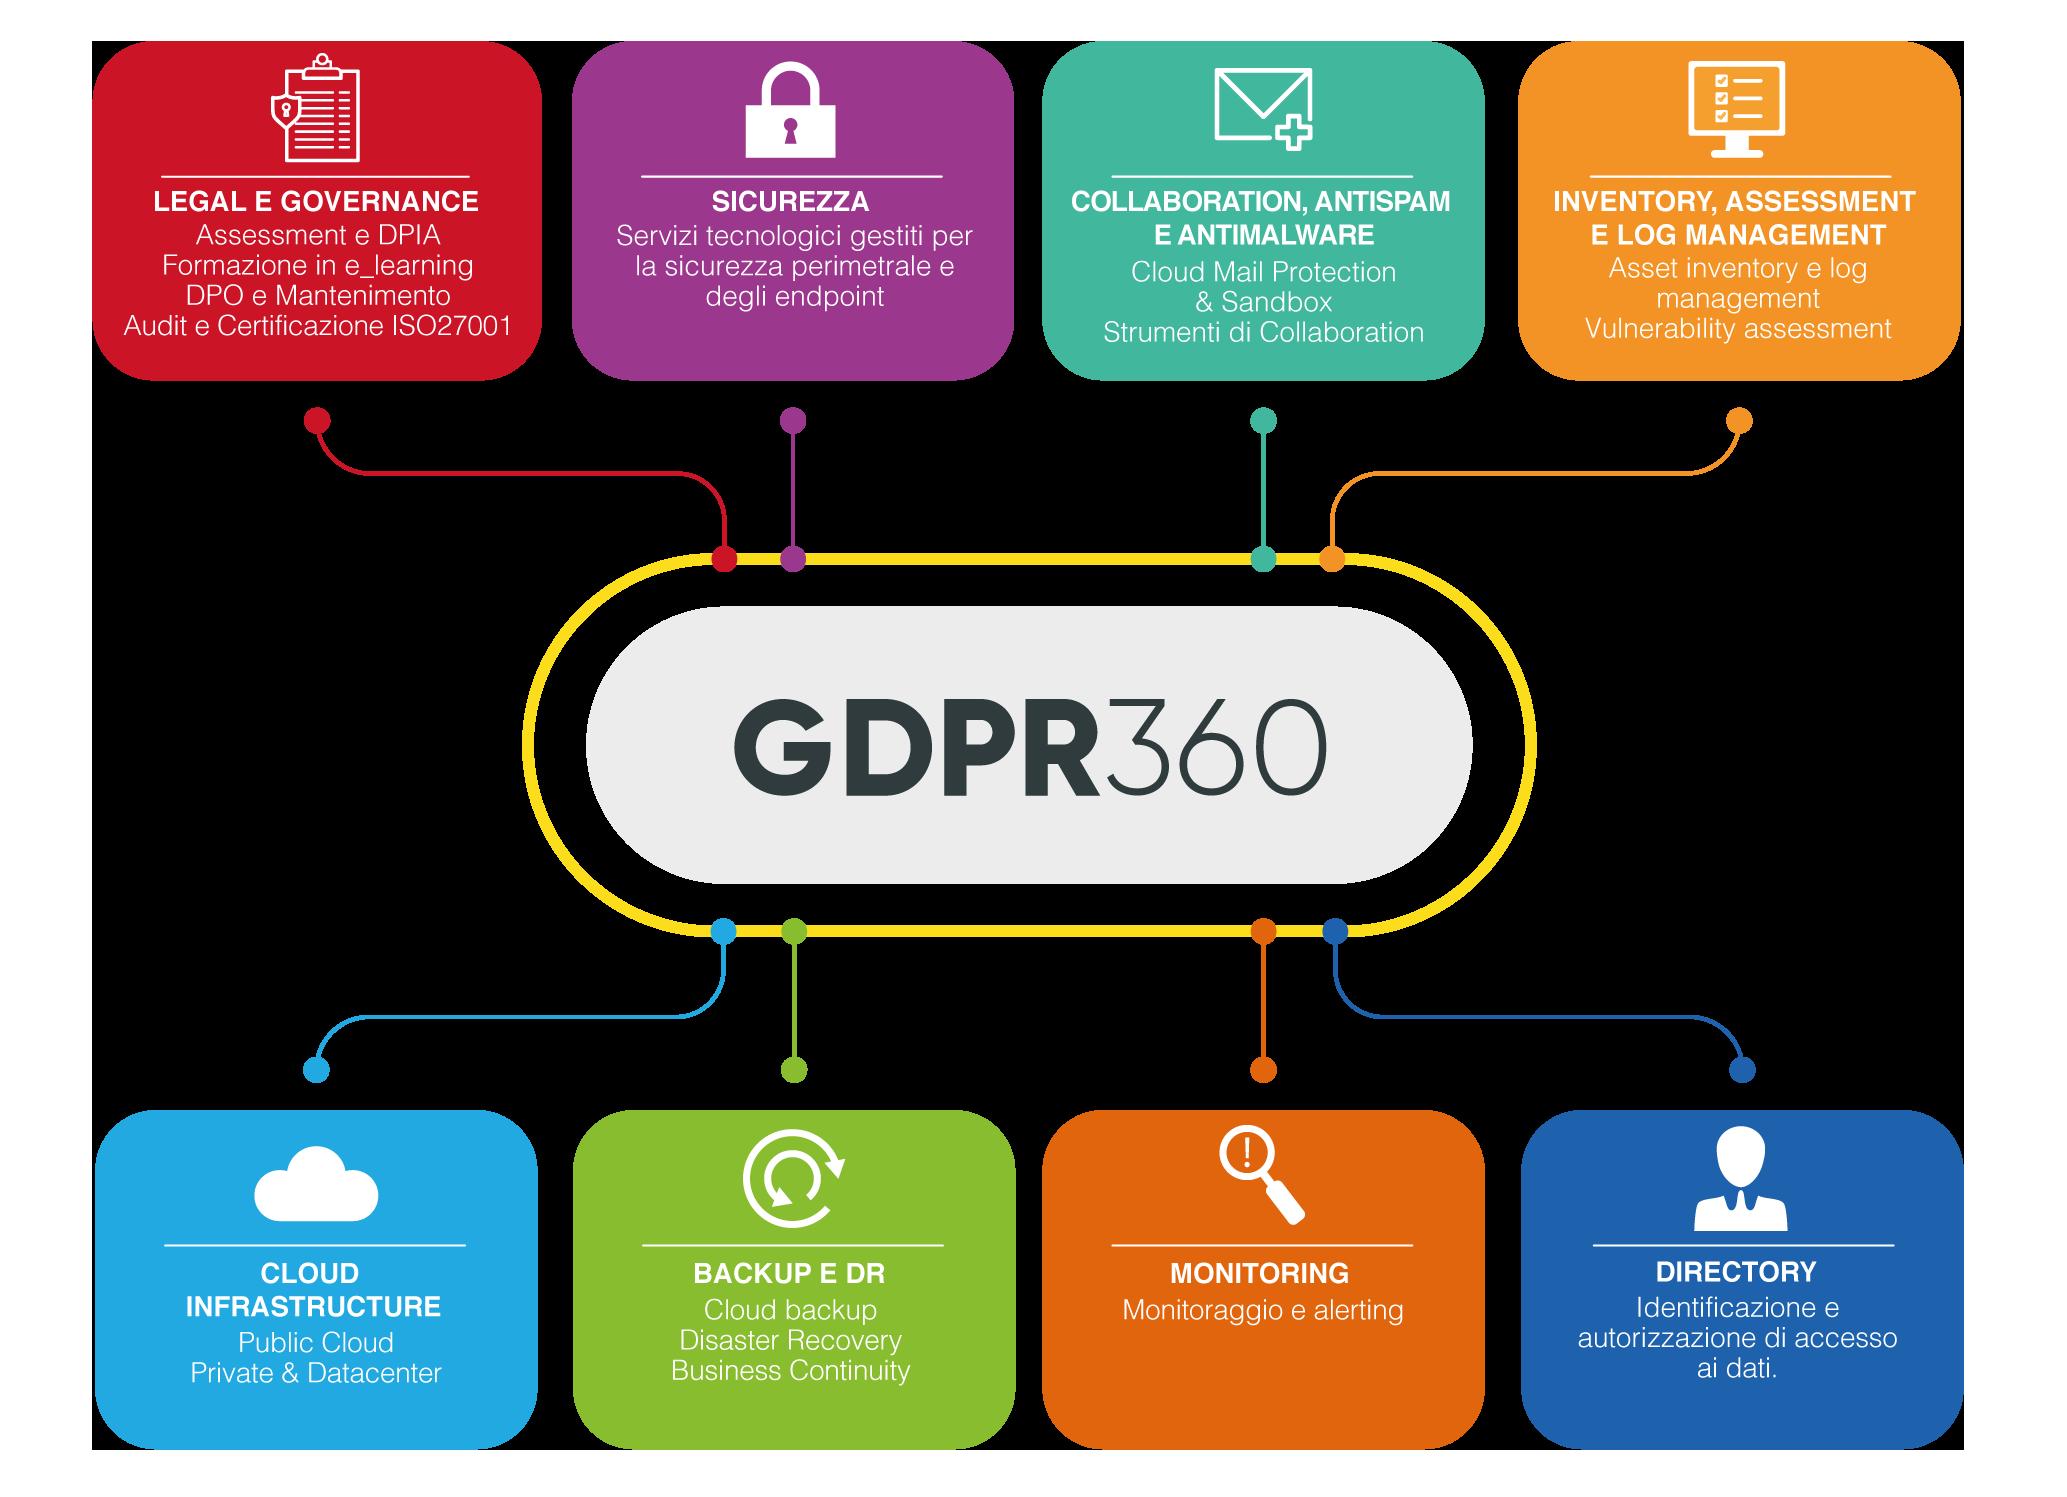 Compliance GDPR 360